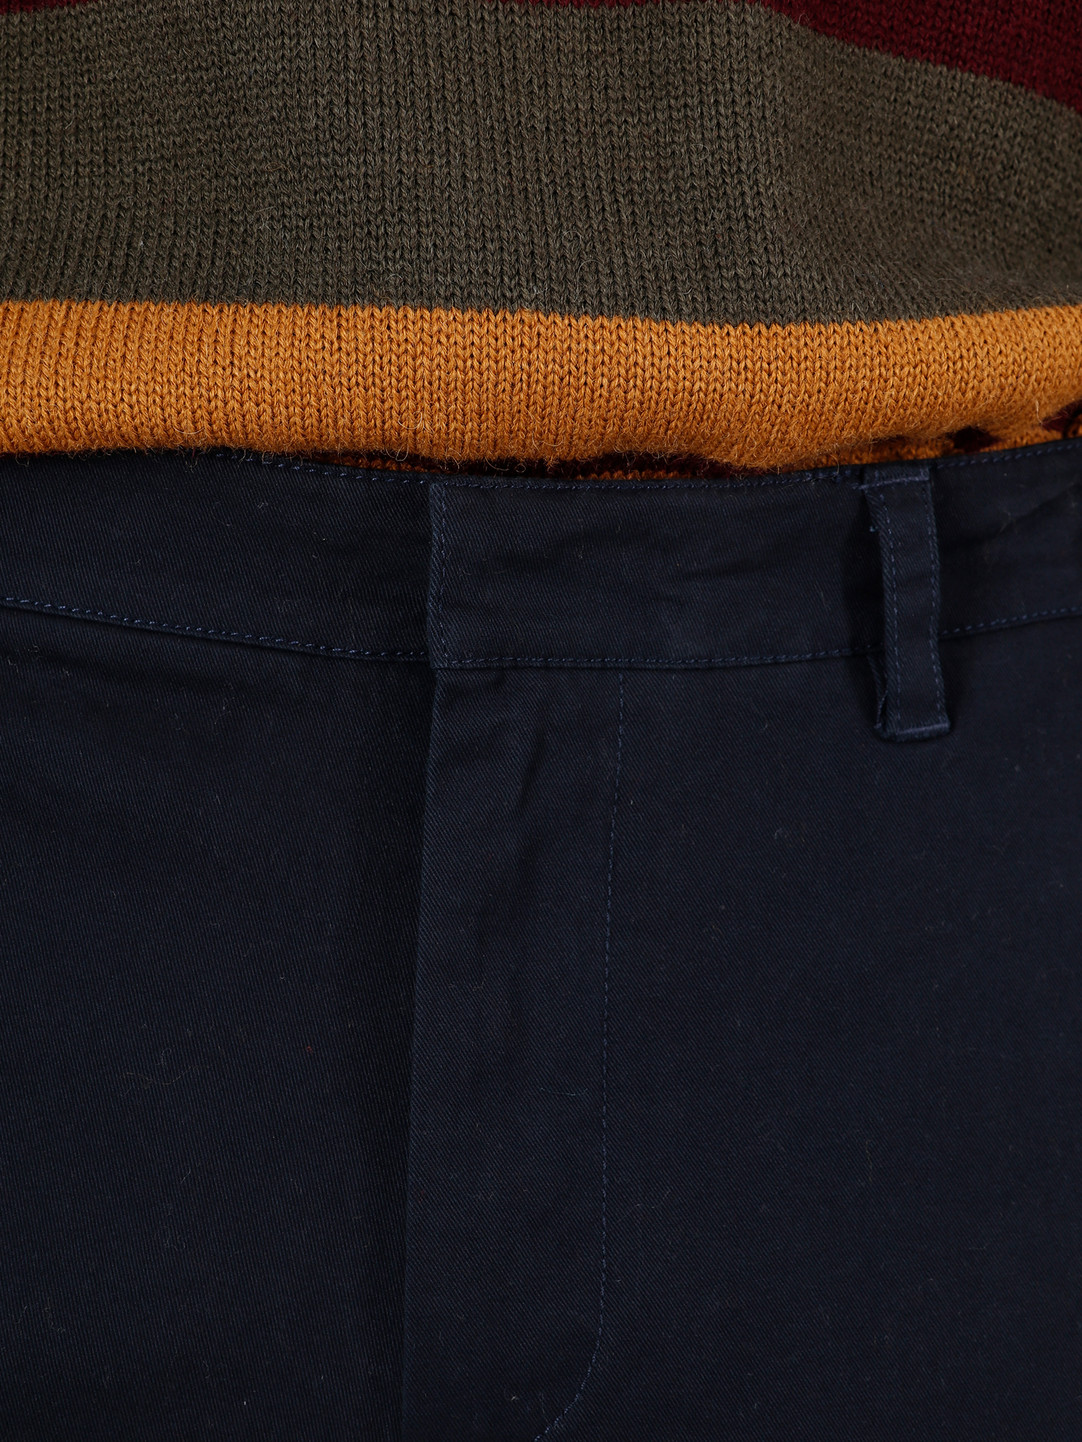 Wemoto Wemoto Joel Pant Navy Blue 141.704-400